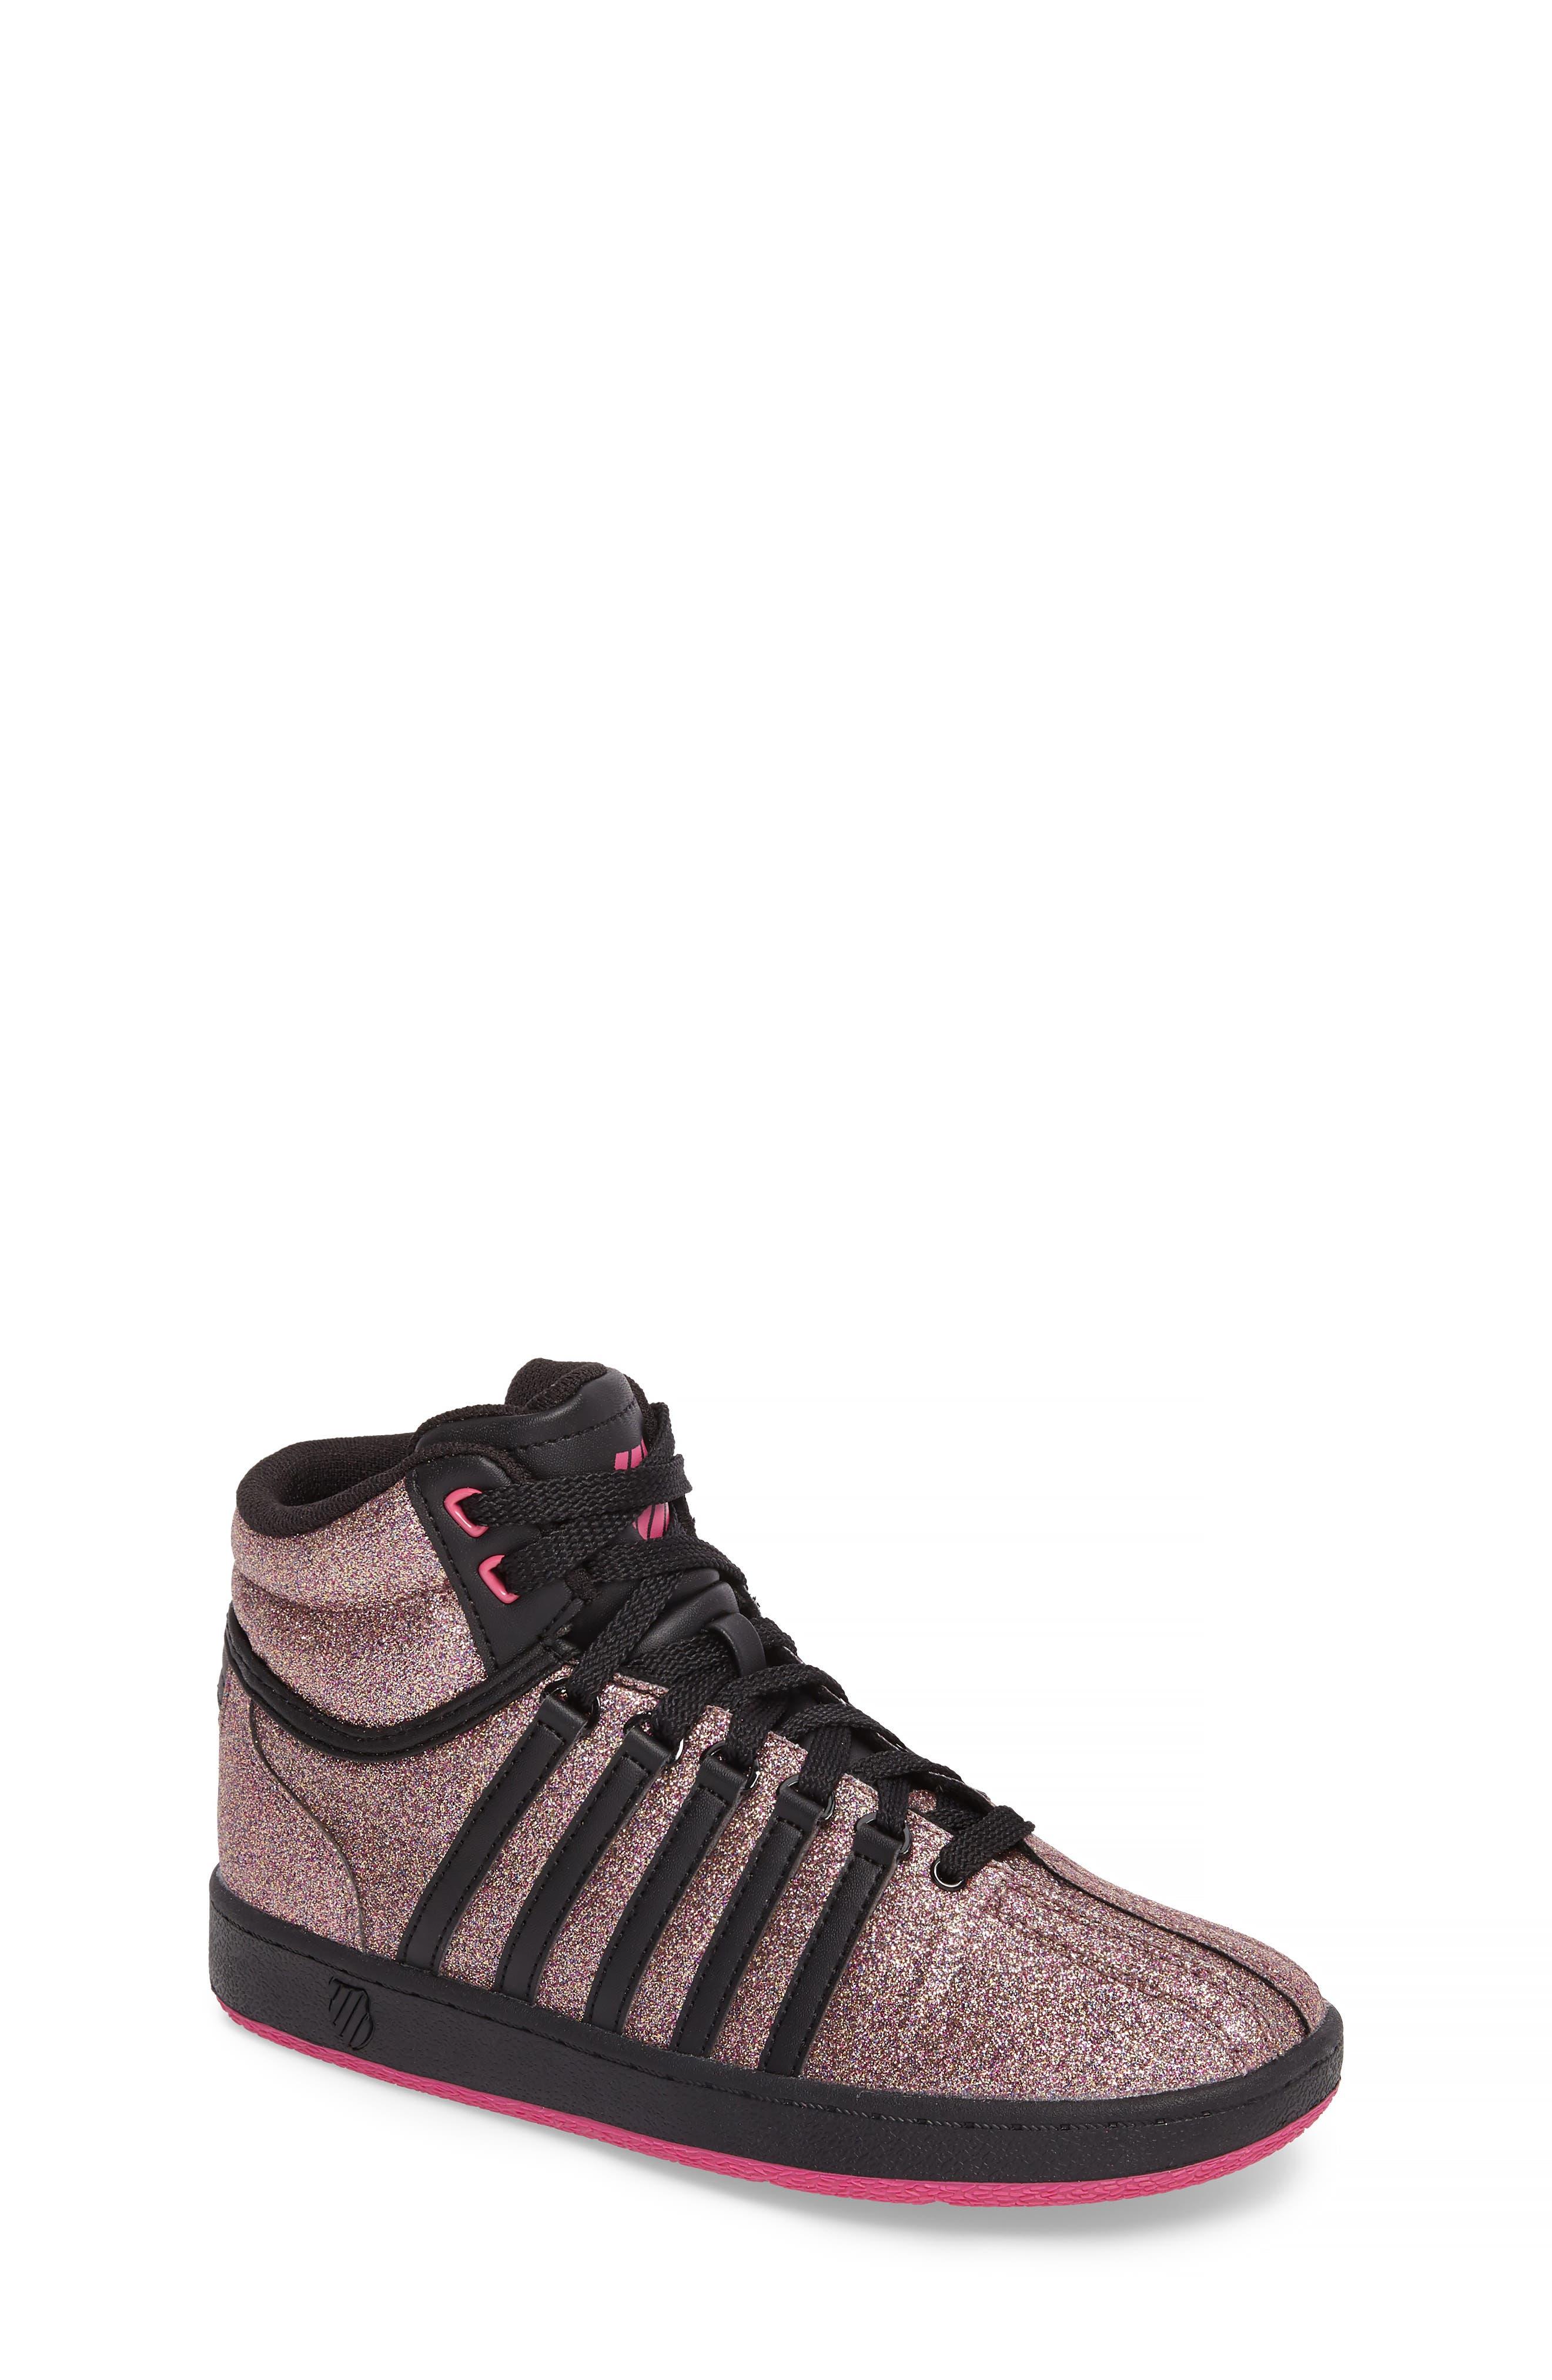 Classic VN Sparkle Mid Sneaker,                             Main thumbnail 1, color,                             MULTI SPARKLE